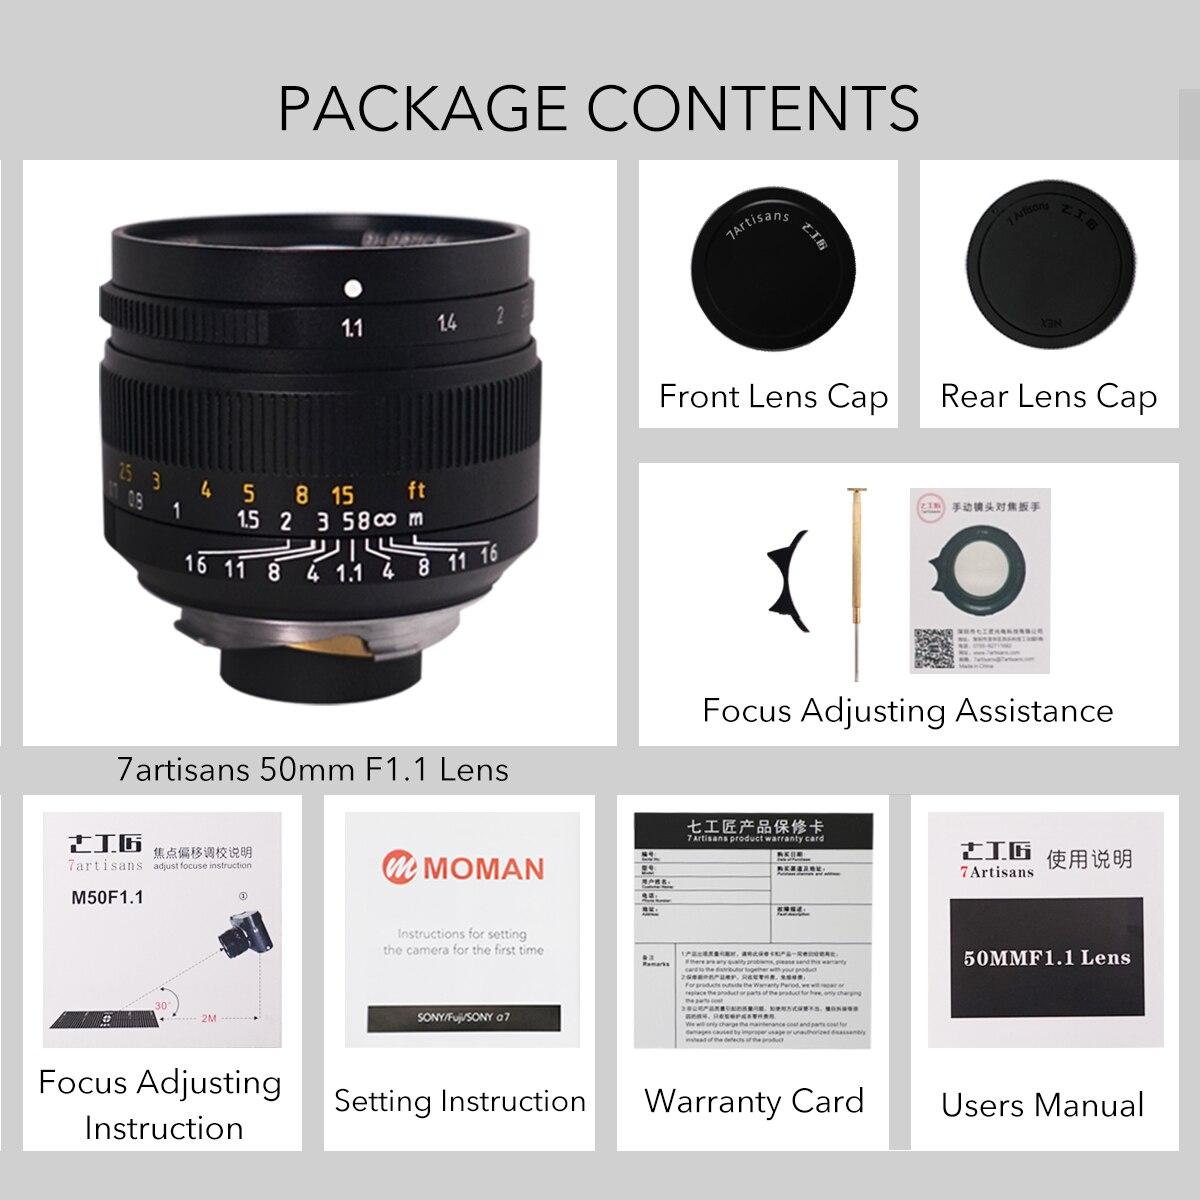 7 artesanos 50mm F1.1large apertura Paraxial M montaje de la lente para las cámaras M M240 M3 M5 M6 M7 M8 M9 M9p M10 - 4